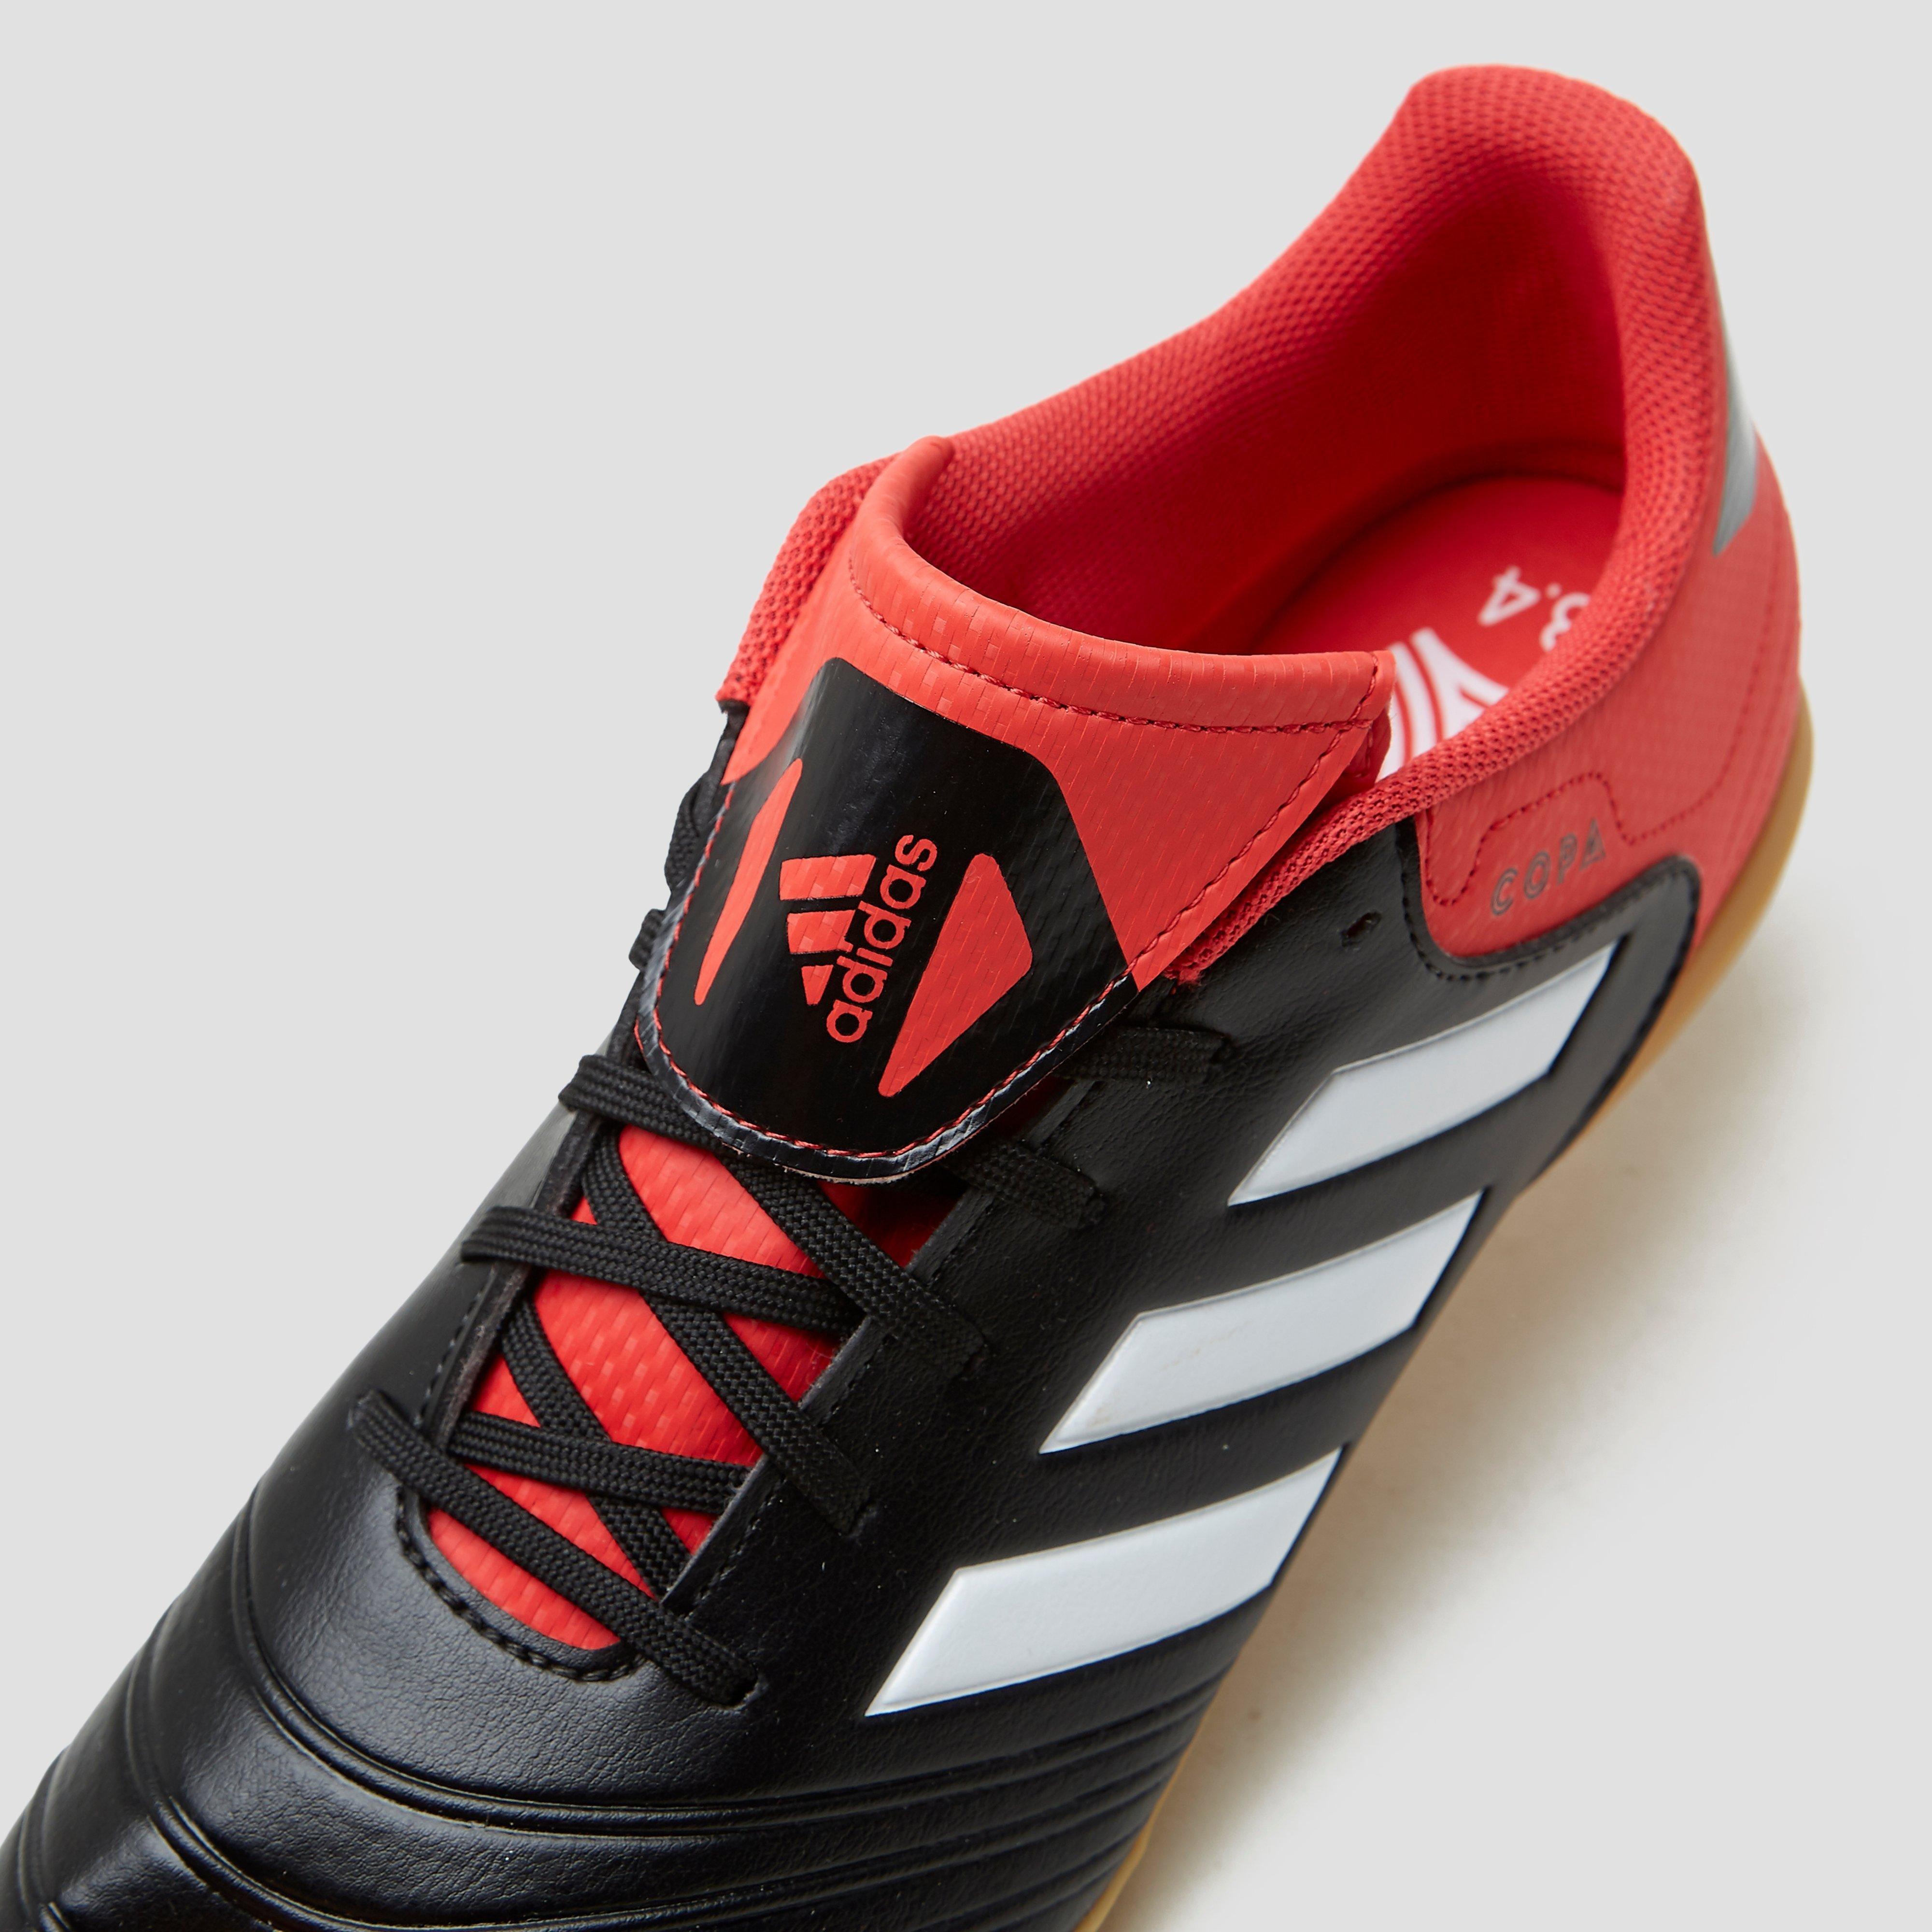 Tango Adidas Copa Hommes 18,4 Dans Le Football - Noir - 46 Eu